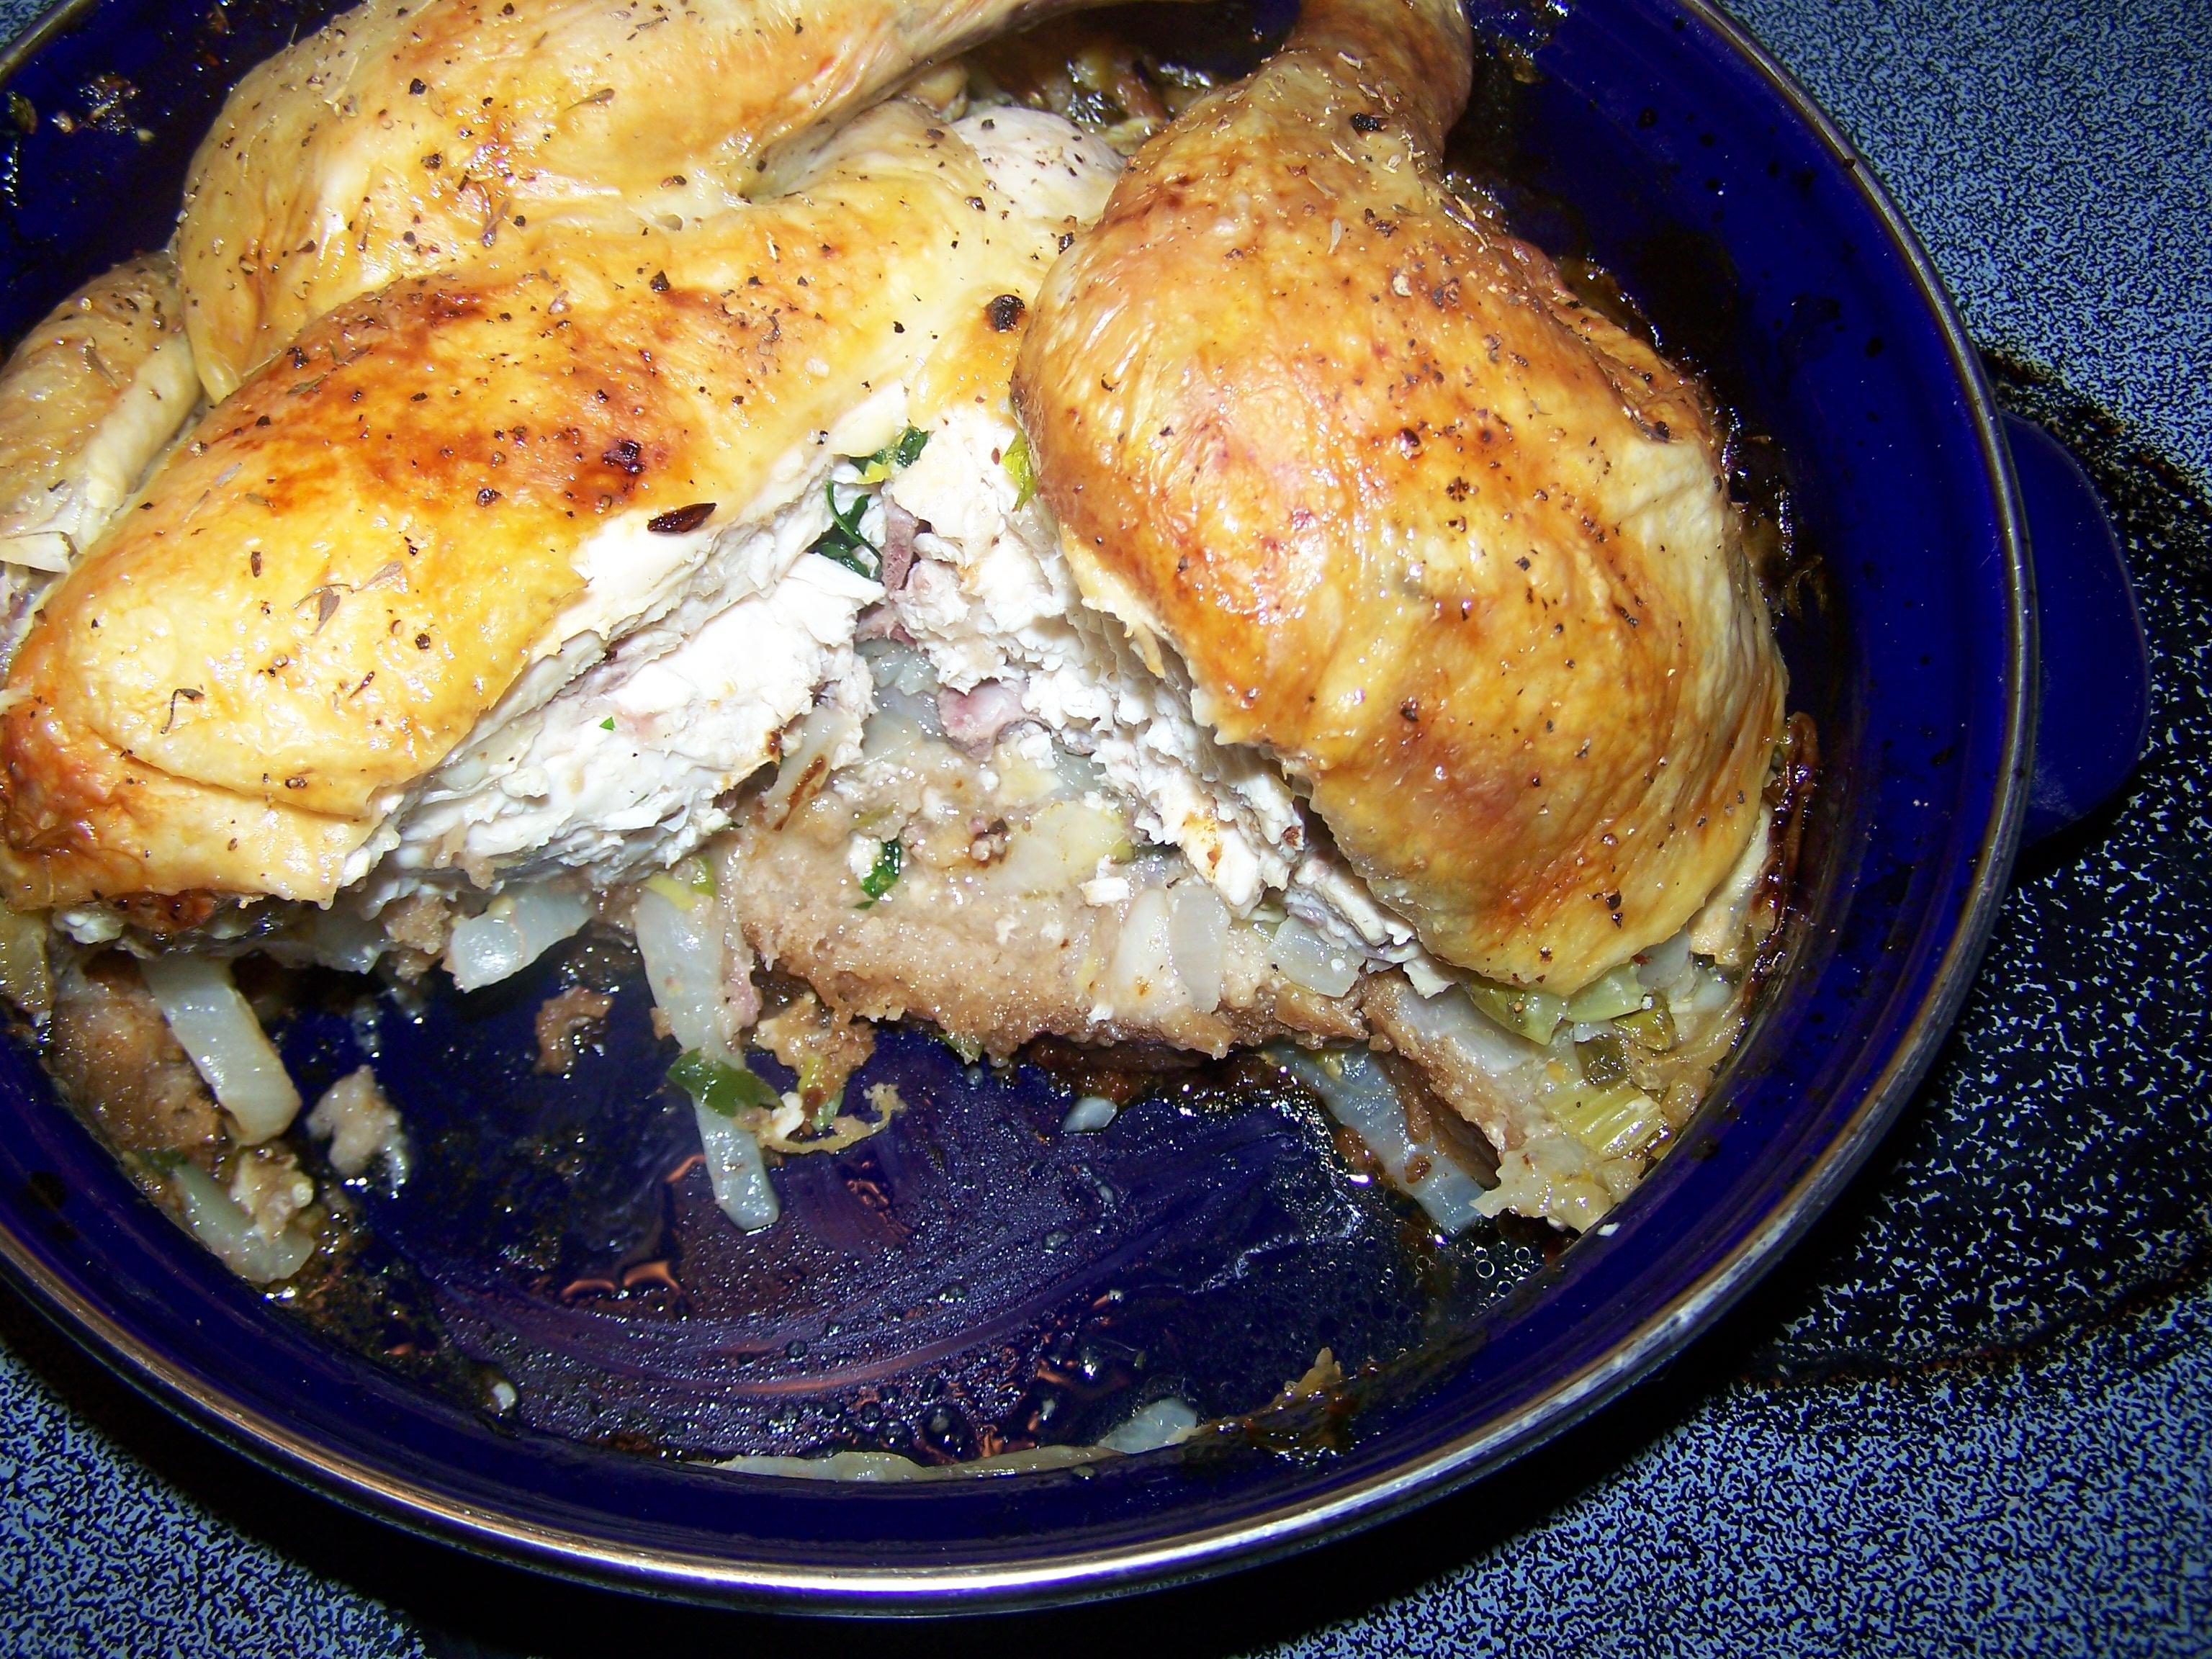 A Serving of Chicken